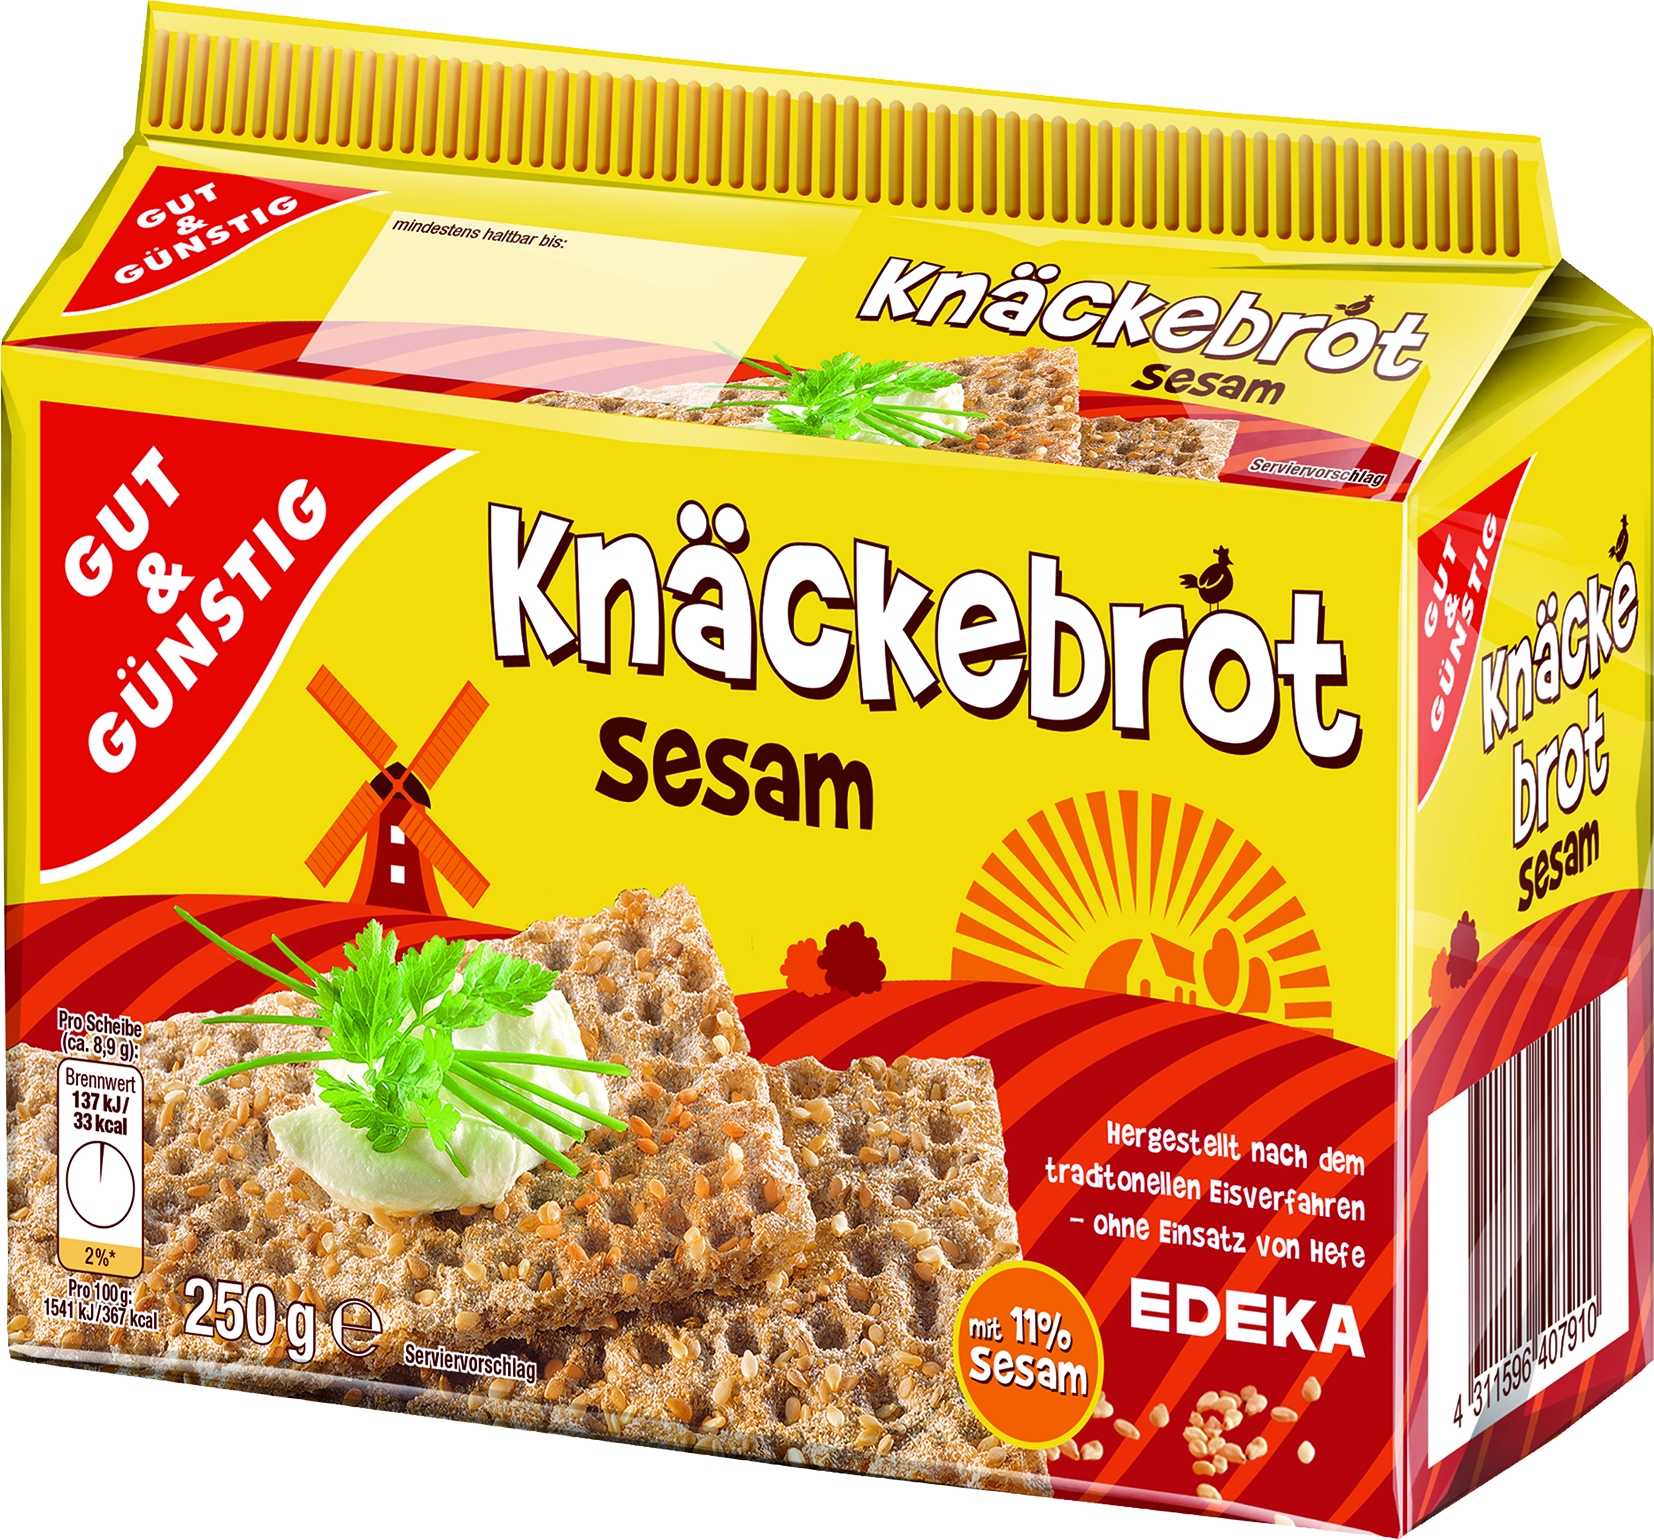 Knaeckebrot Sesam